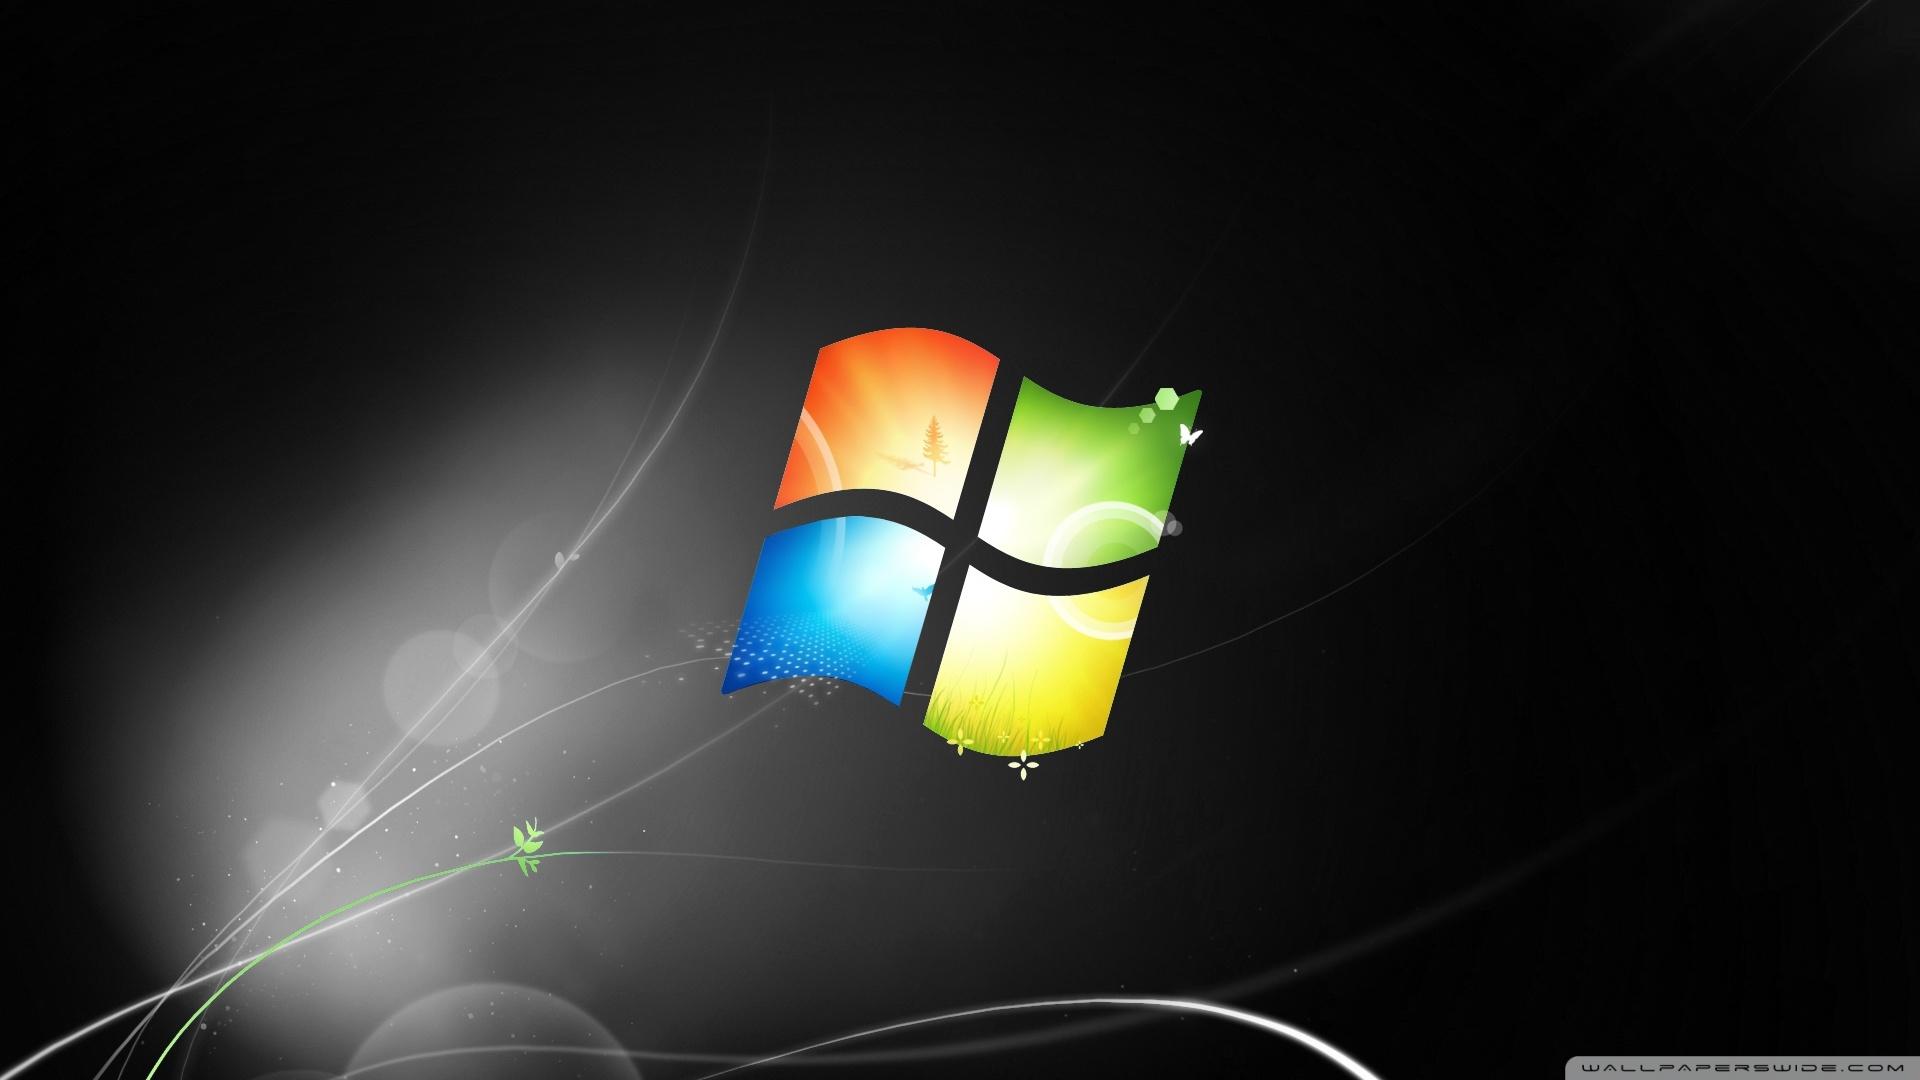 2 background images windows 7 - Windows 7s One Year Anniversary 2 Wallpaper 1920x1080 Windows 7s One